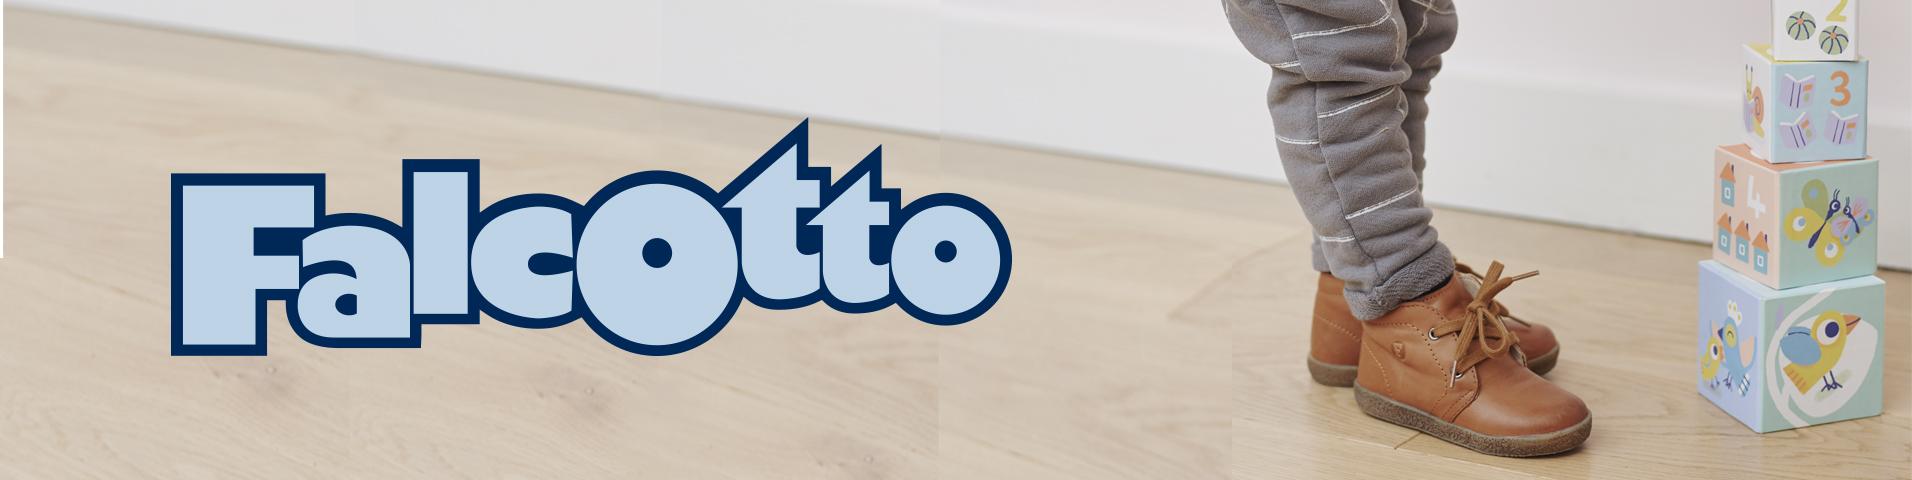 Falcotto Online Shop | Falcotto bezpłatna przesyłka